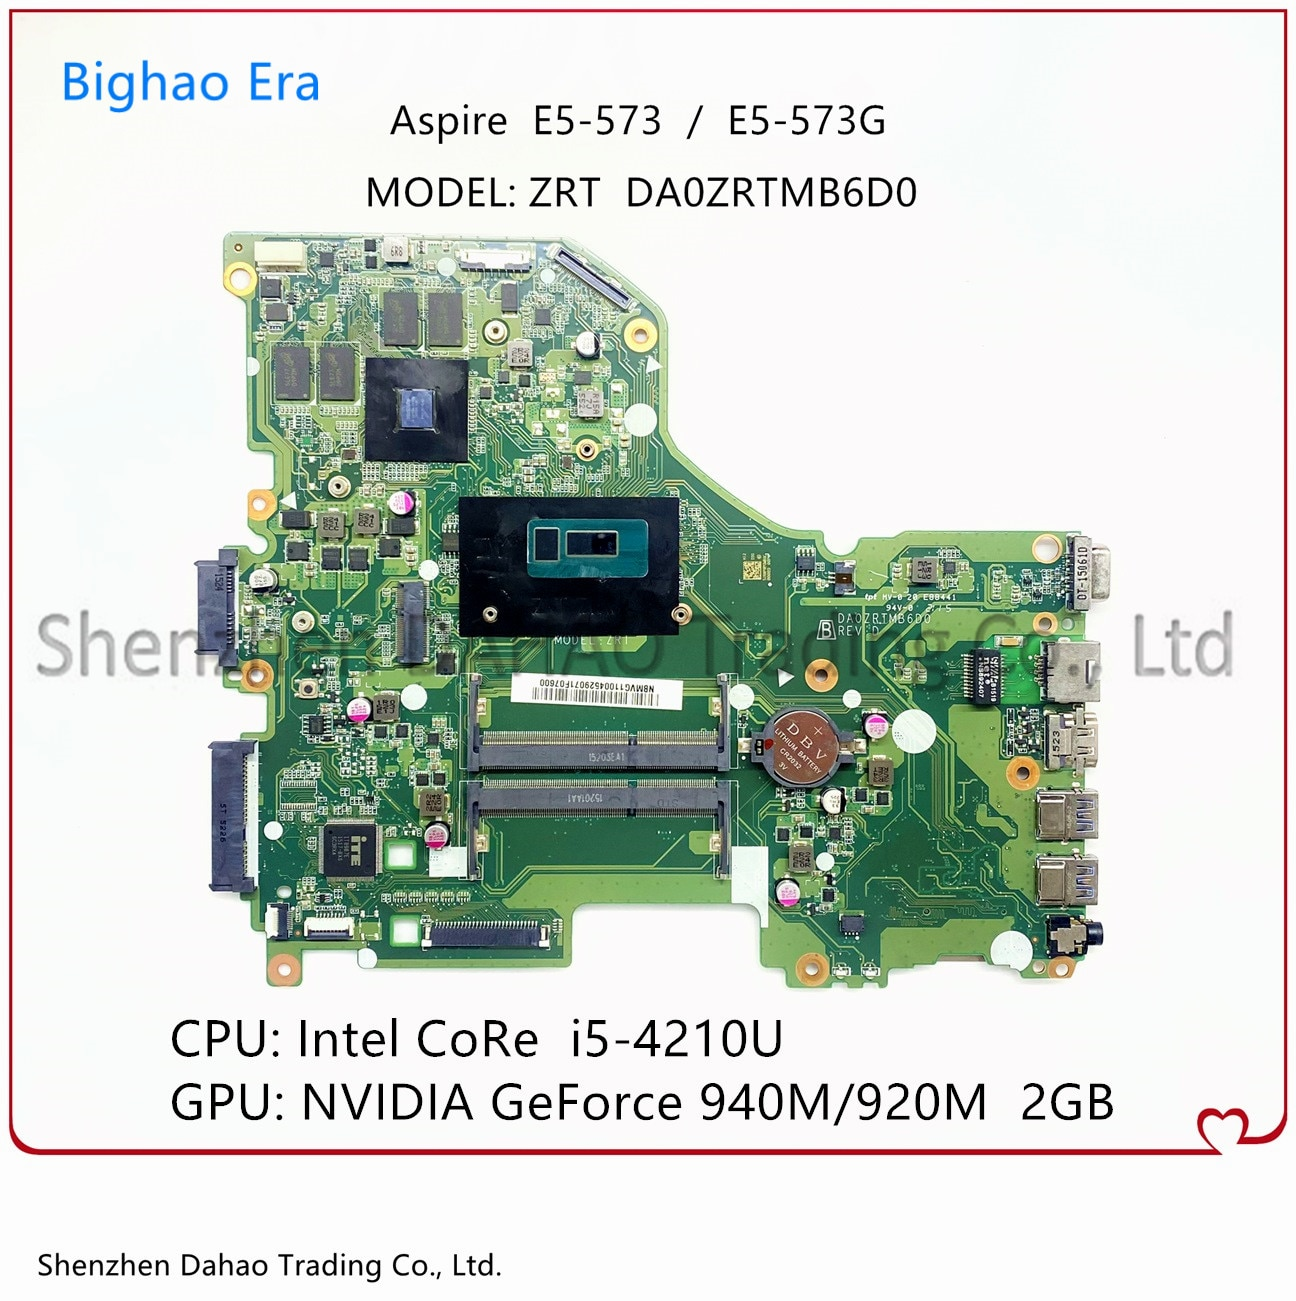 DA0ZRTMB6D0 ZRT اللوحة الرئيسية لشركة أيسر E5-573 اللوحة الأم لأجهزة الكمبيوتر المحمول E5-573G NBMVM11003 ث/i5-4210U وحدة المعالجة المركزية GT920M/940M 2G-GPU 100% اختبارها